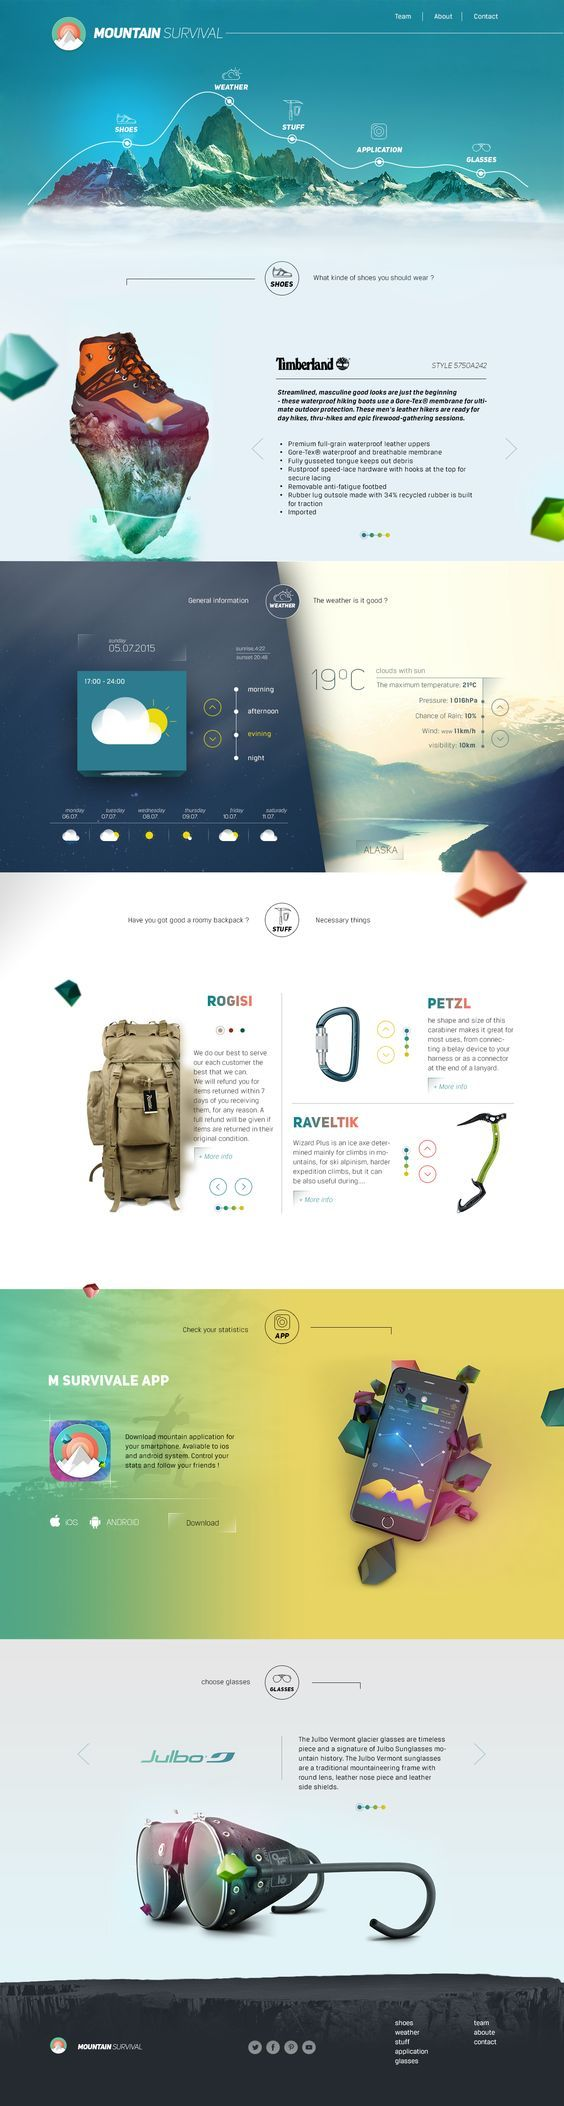 Best Web Designs for Inspiration!